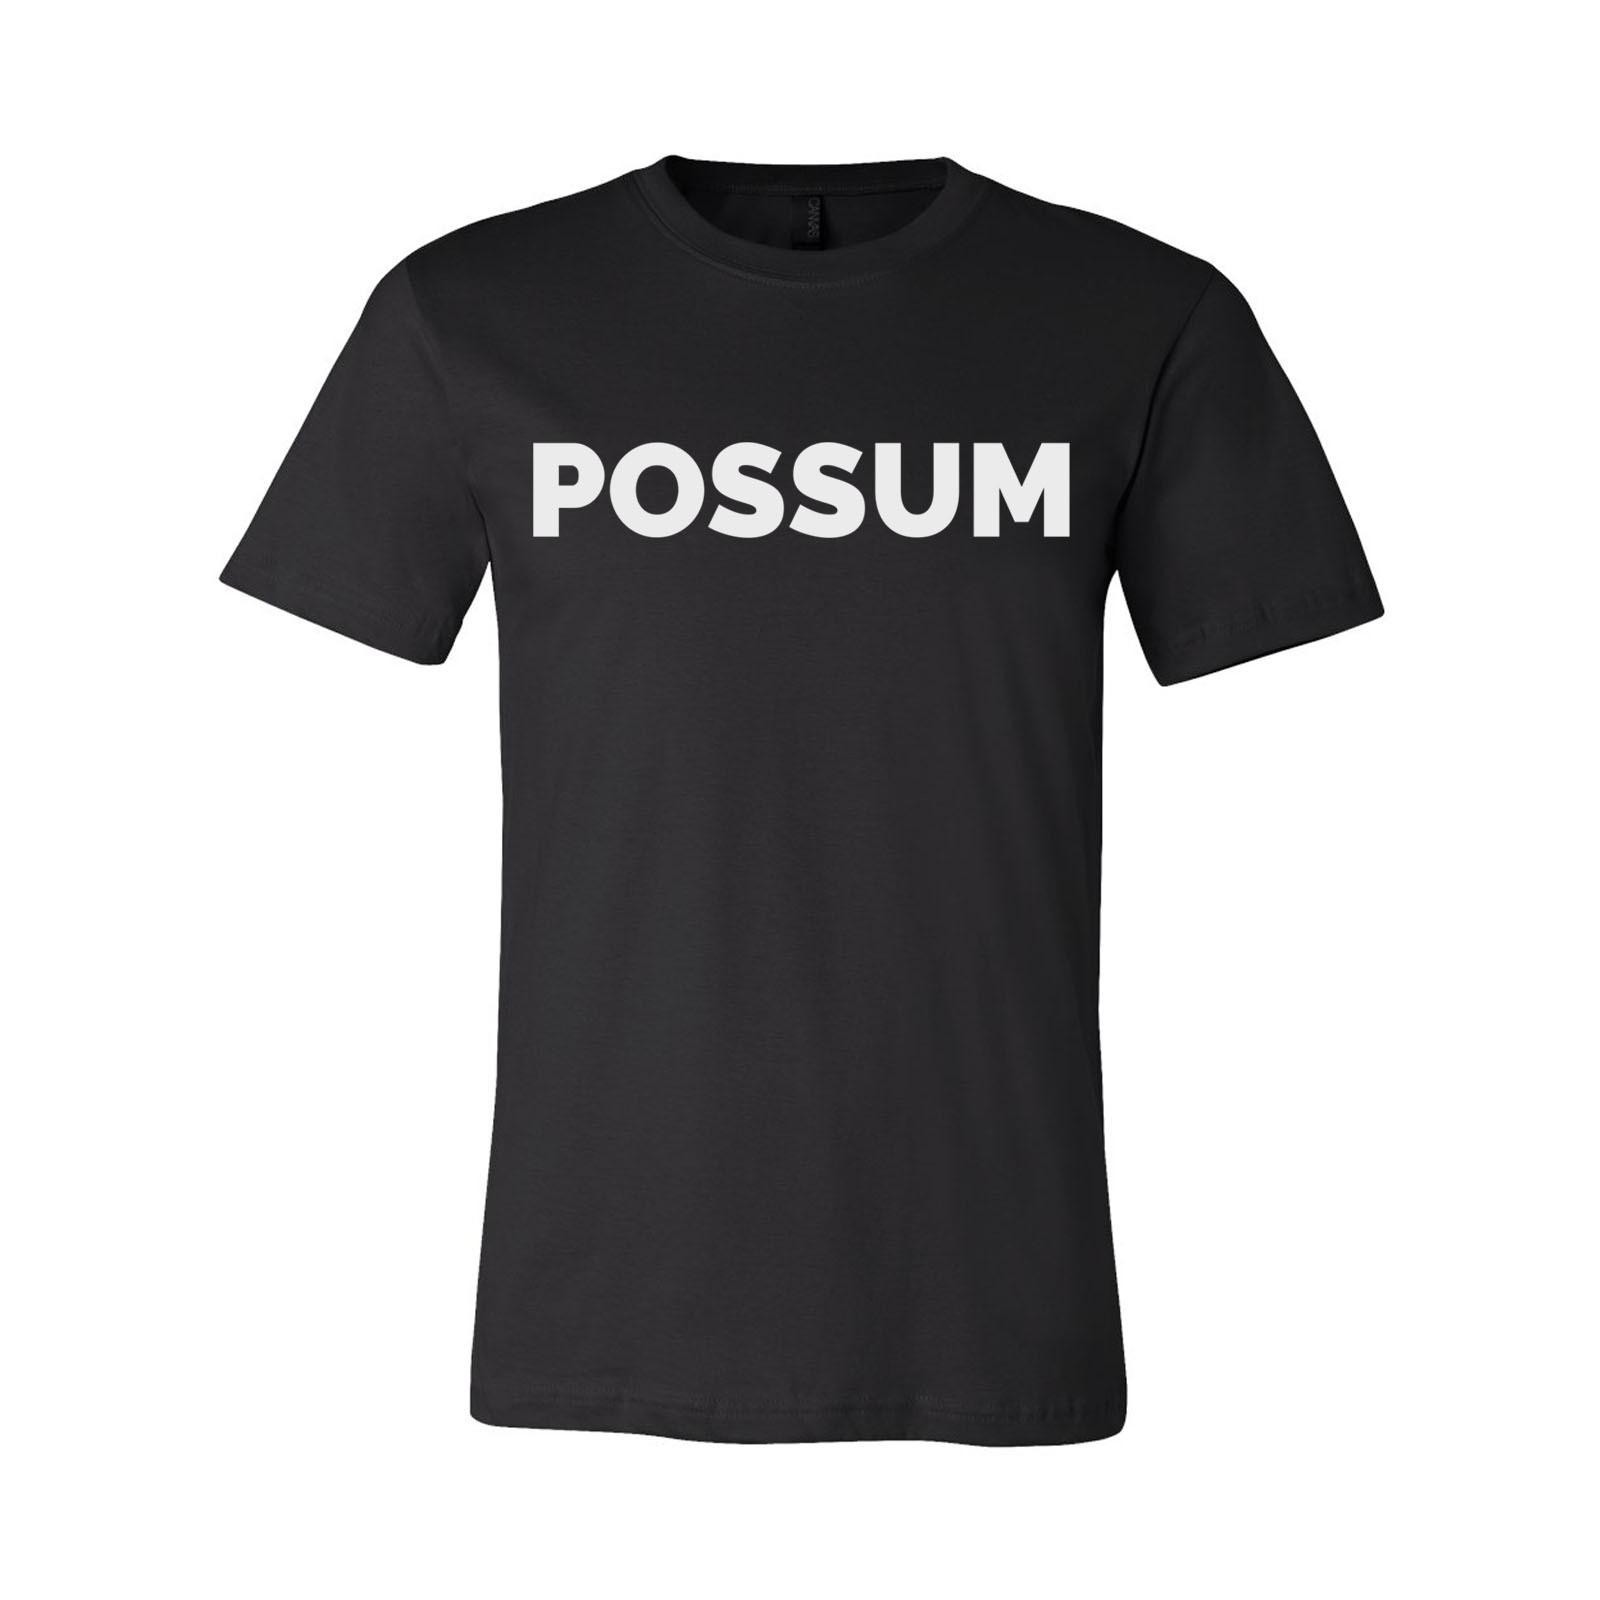 George Jones Possum T-Shirt - Black